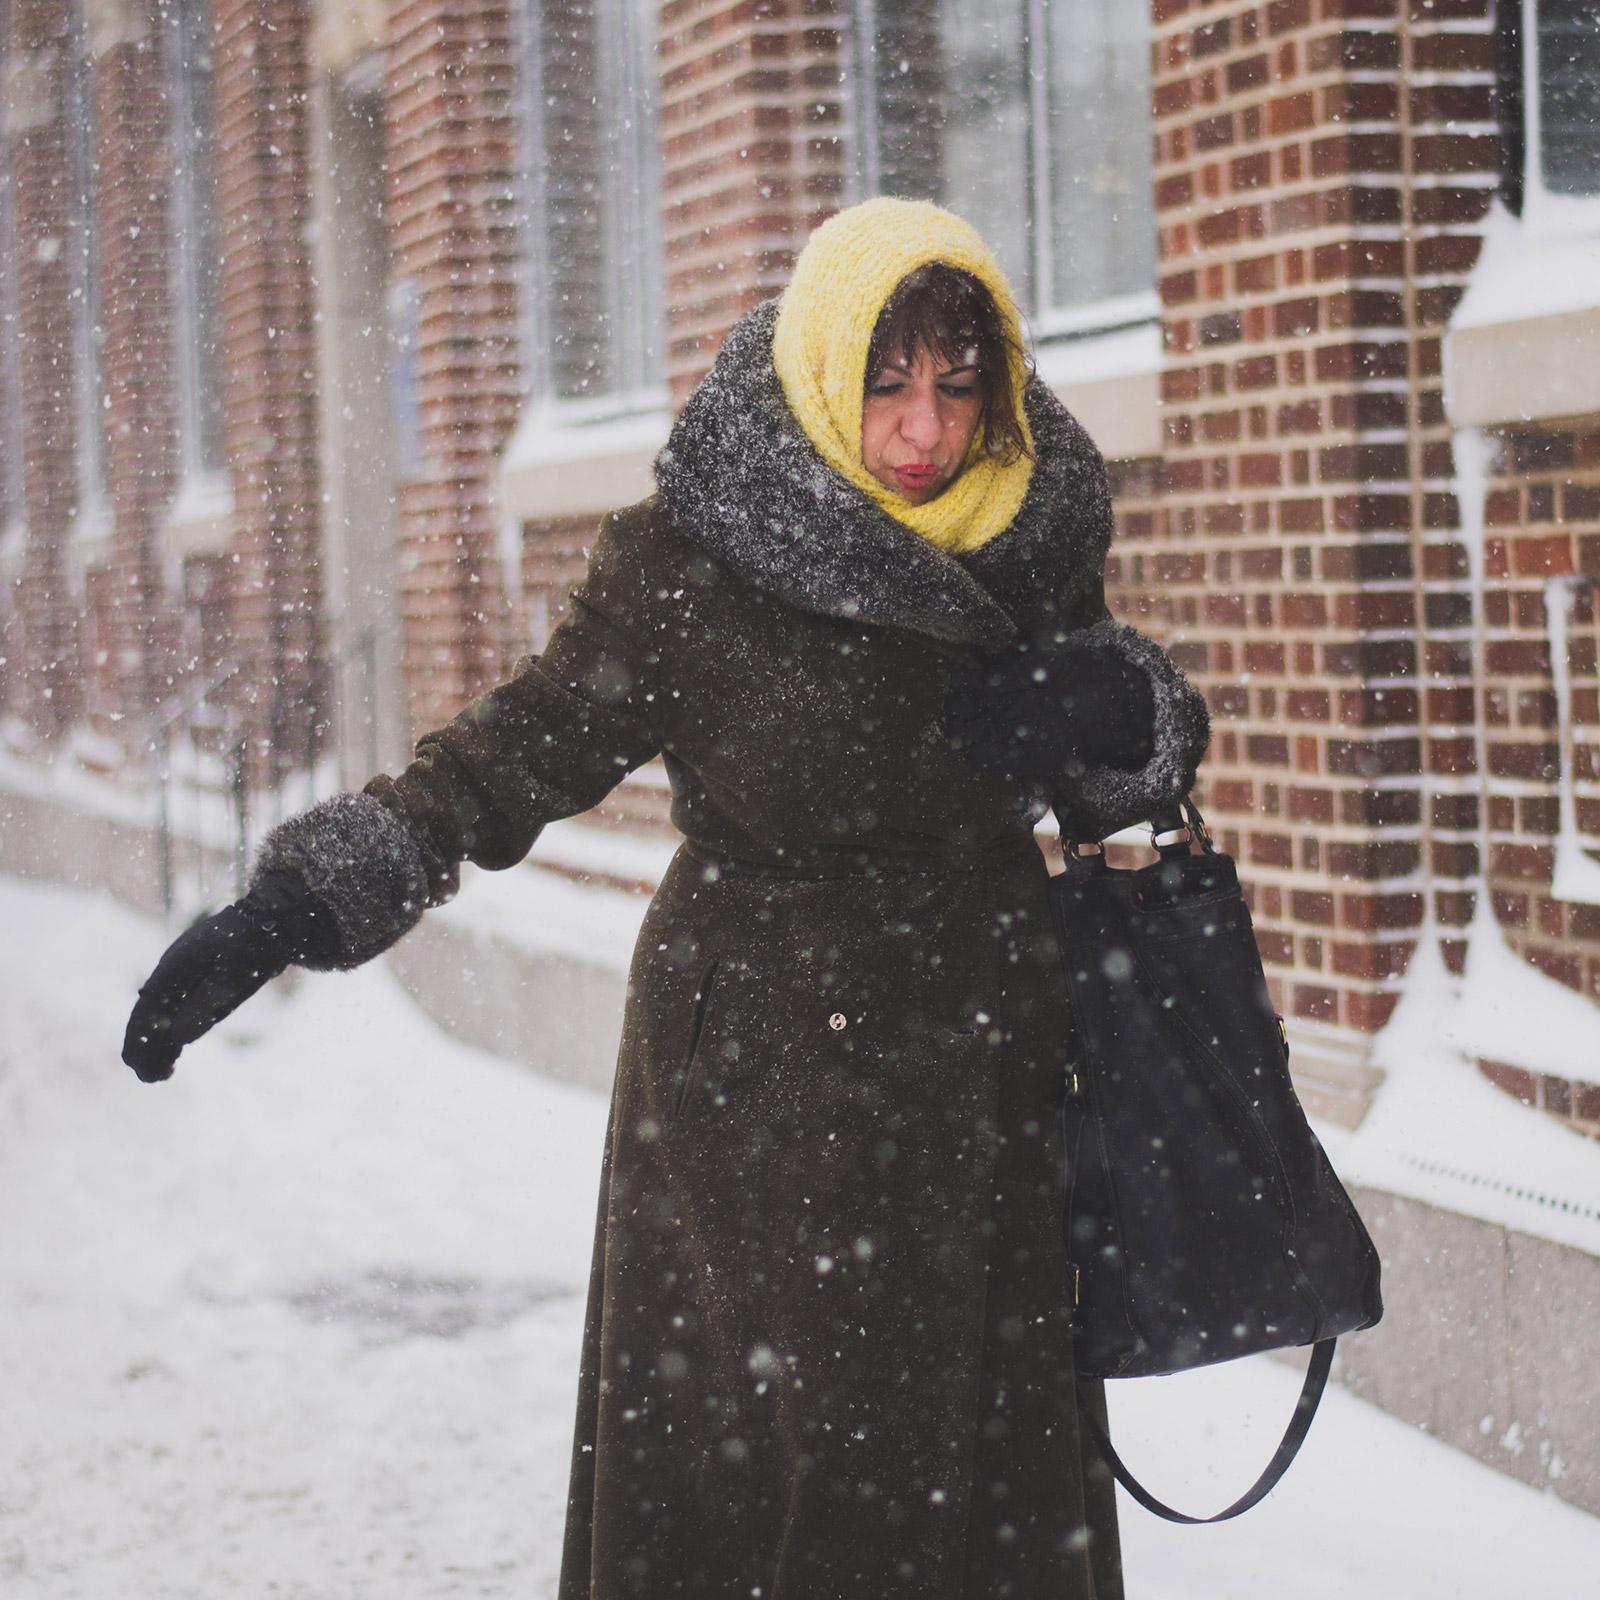 woman walking in the snow in city street